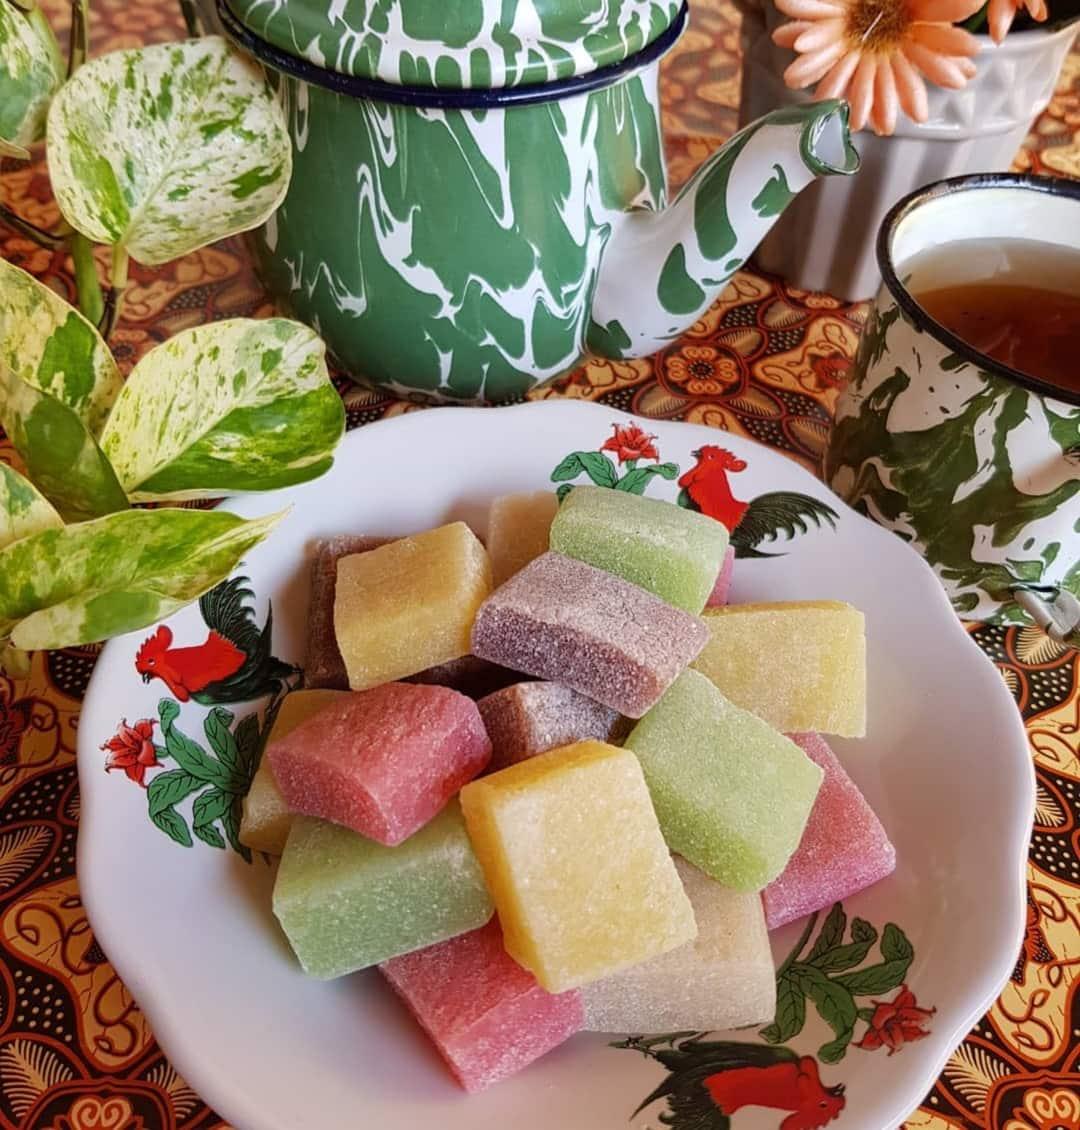 Makanan Enak Khas Jogja - Geplak - triwinar76 - Yangko - dapoersikoko